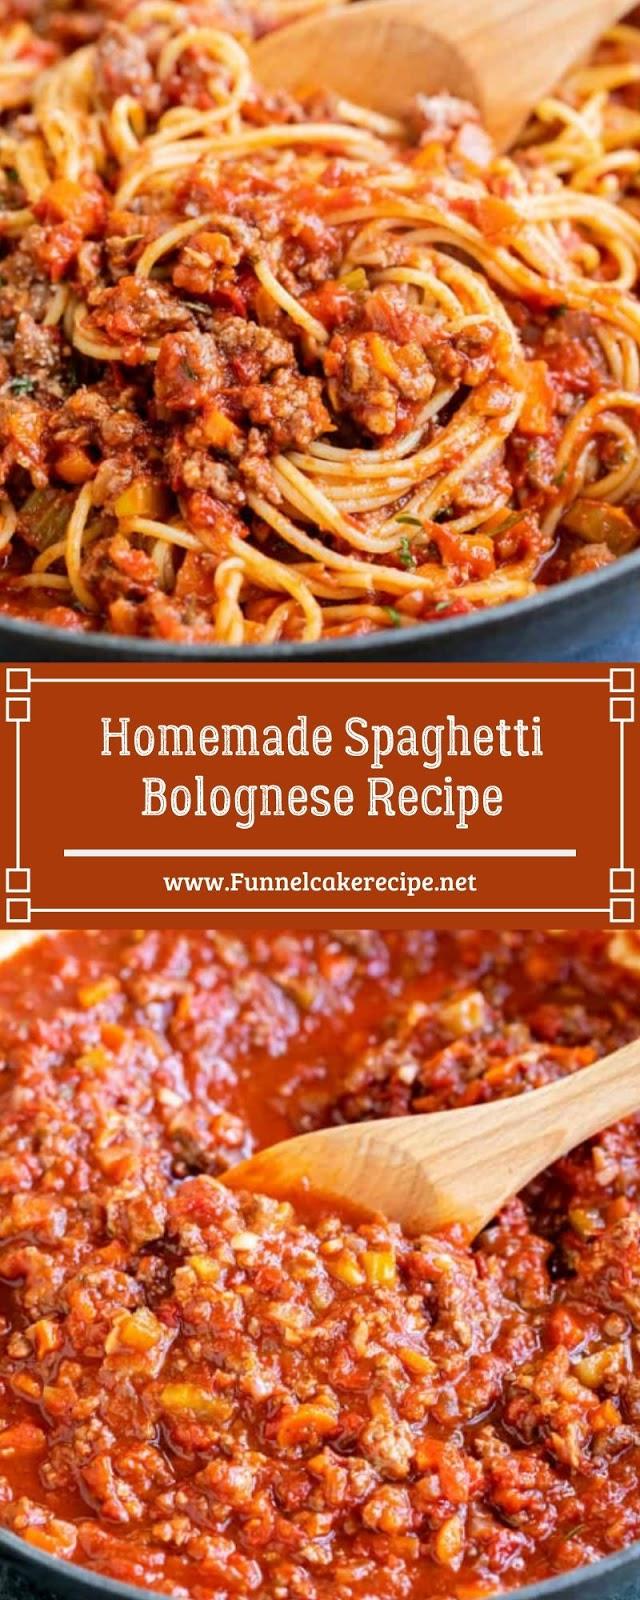 Homemade Spaghetti Bolognese Recipe